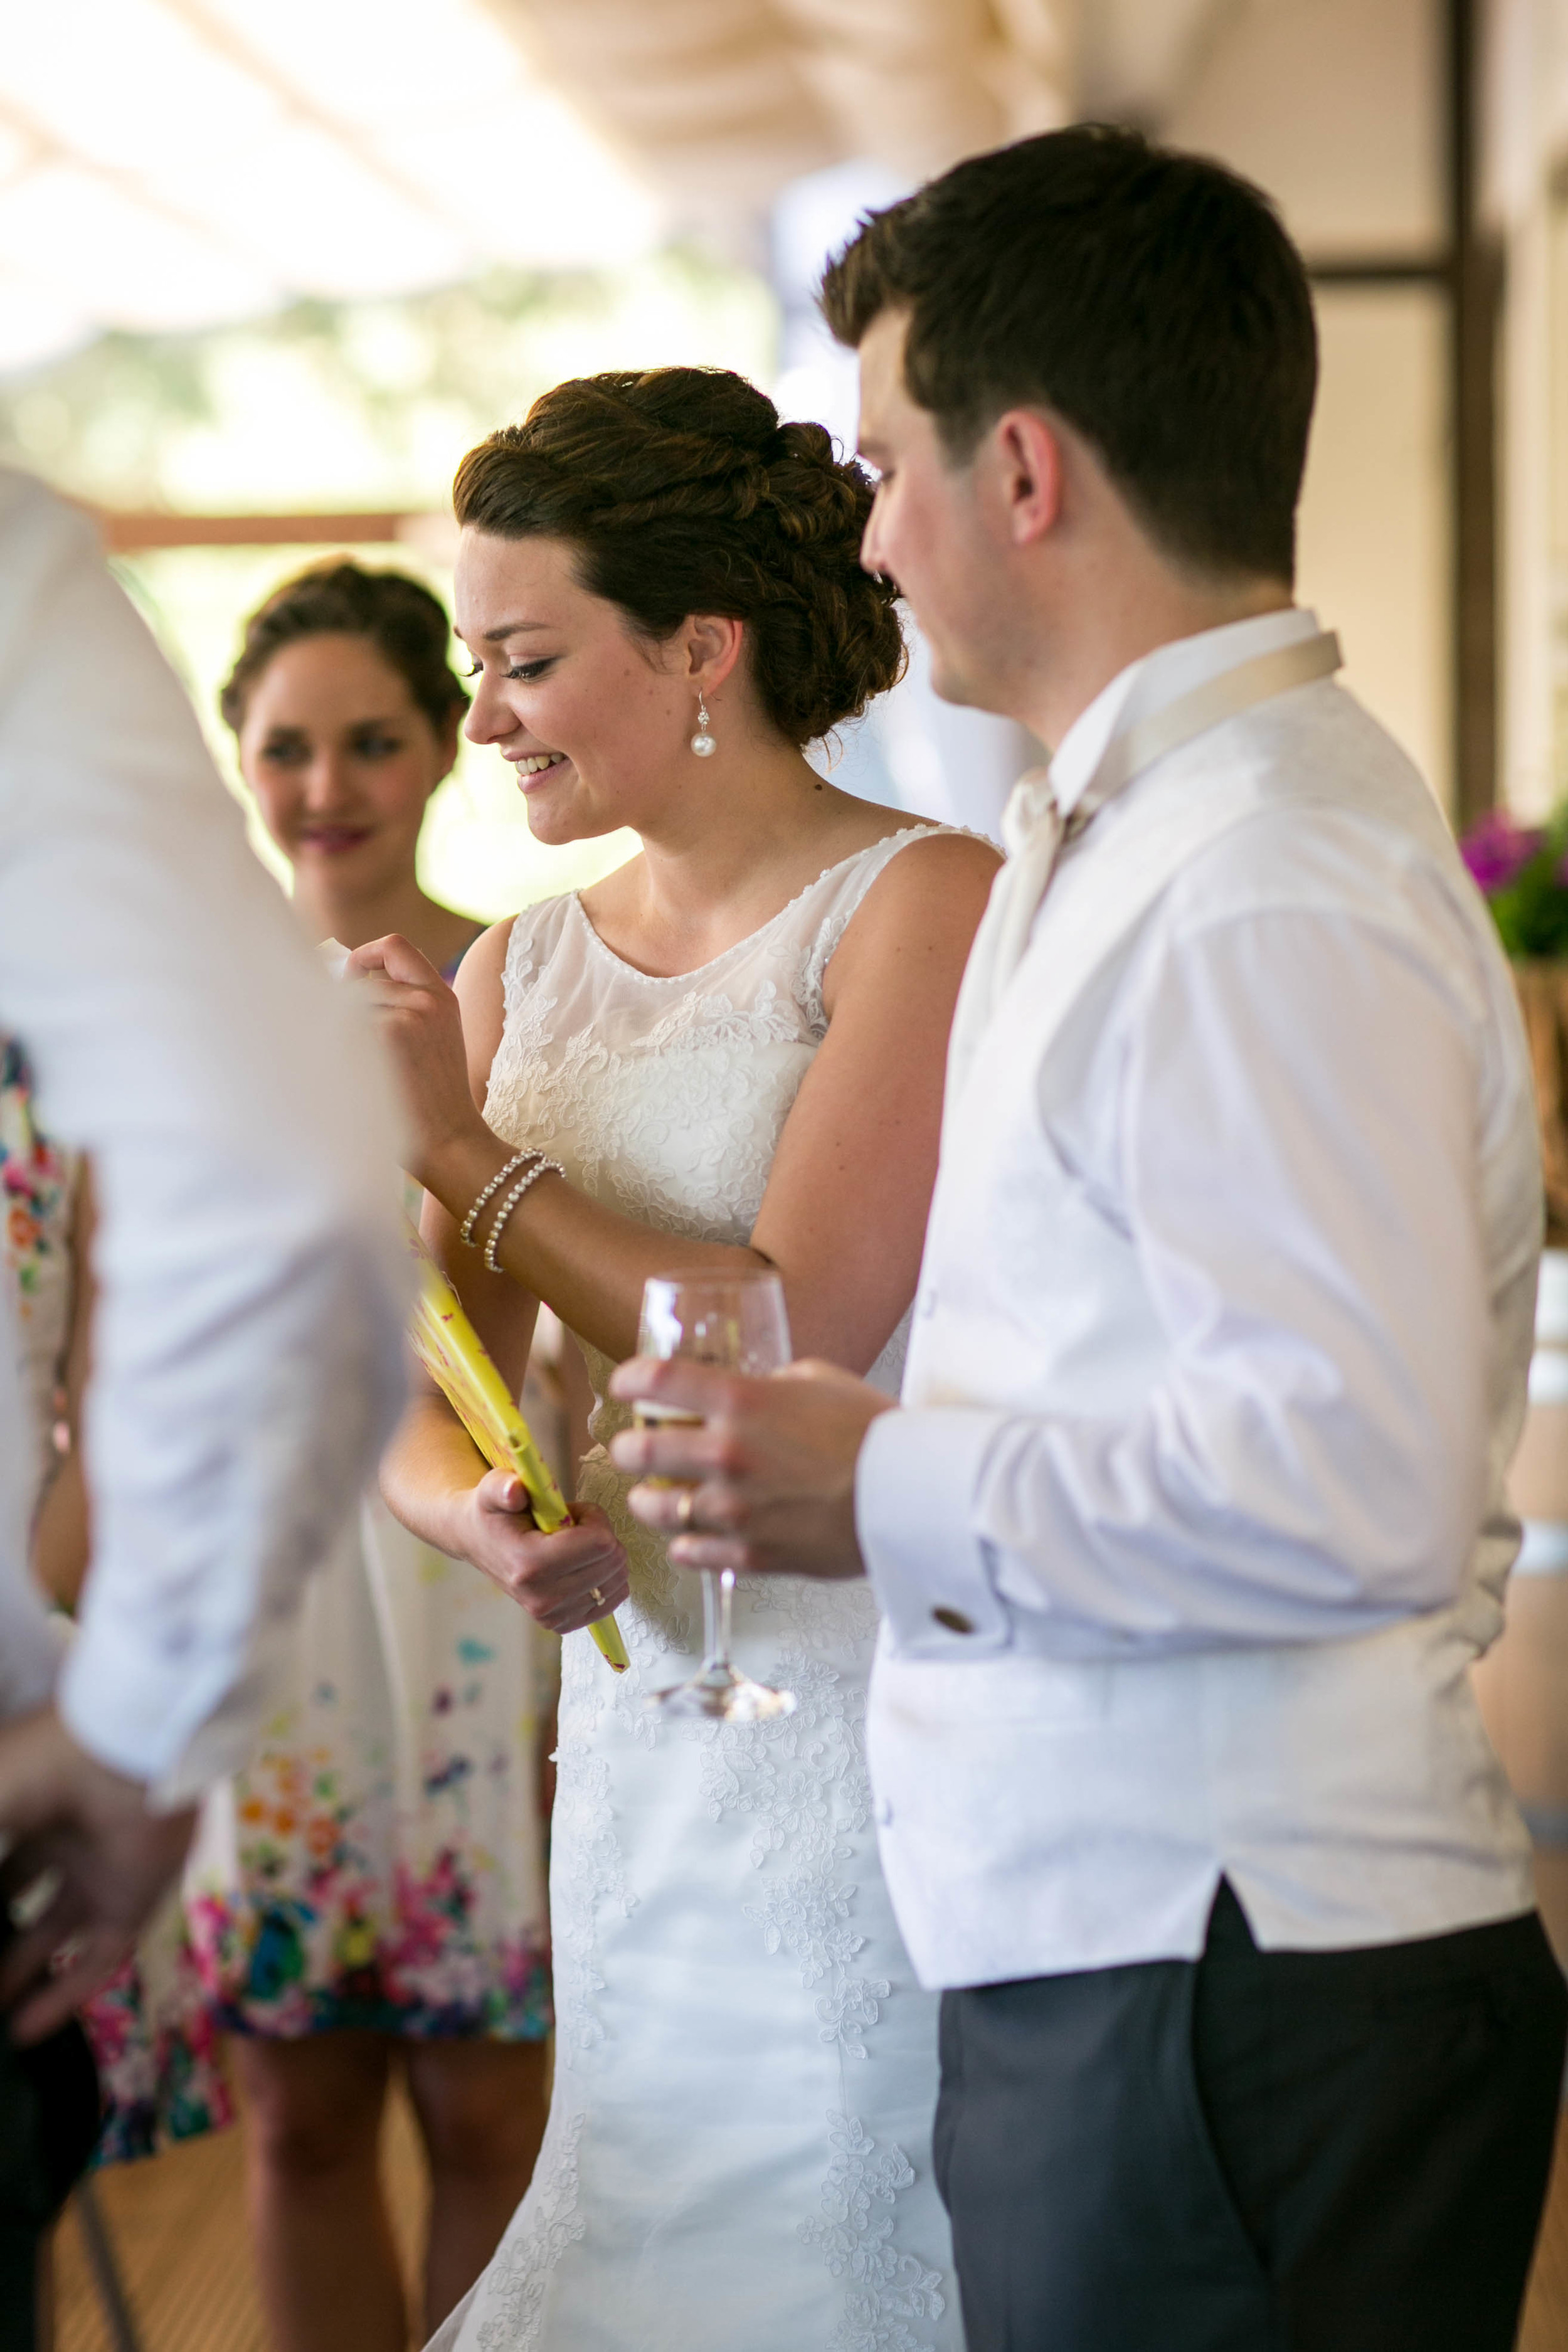 Hochzeitsfotografie Berlin_Fran Burrows Fotografie-296.jpg